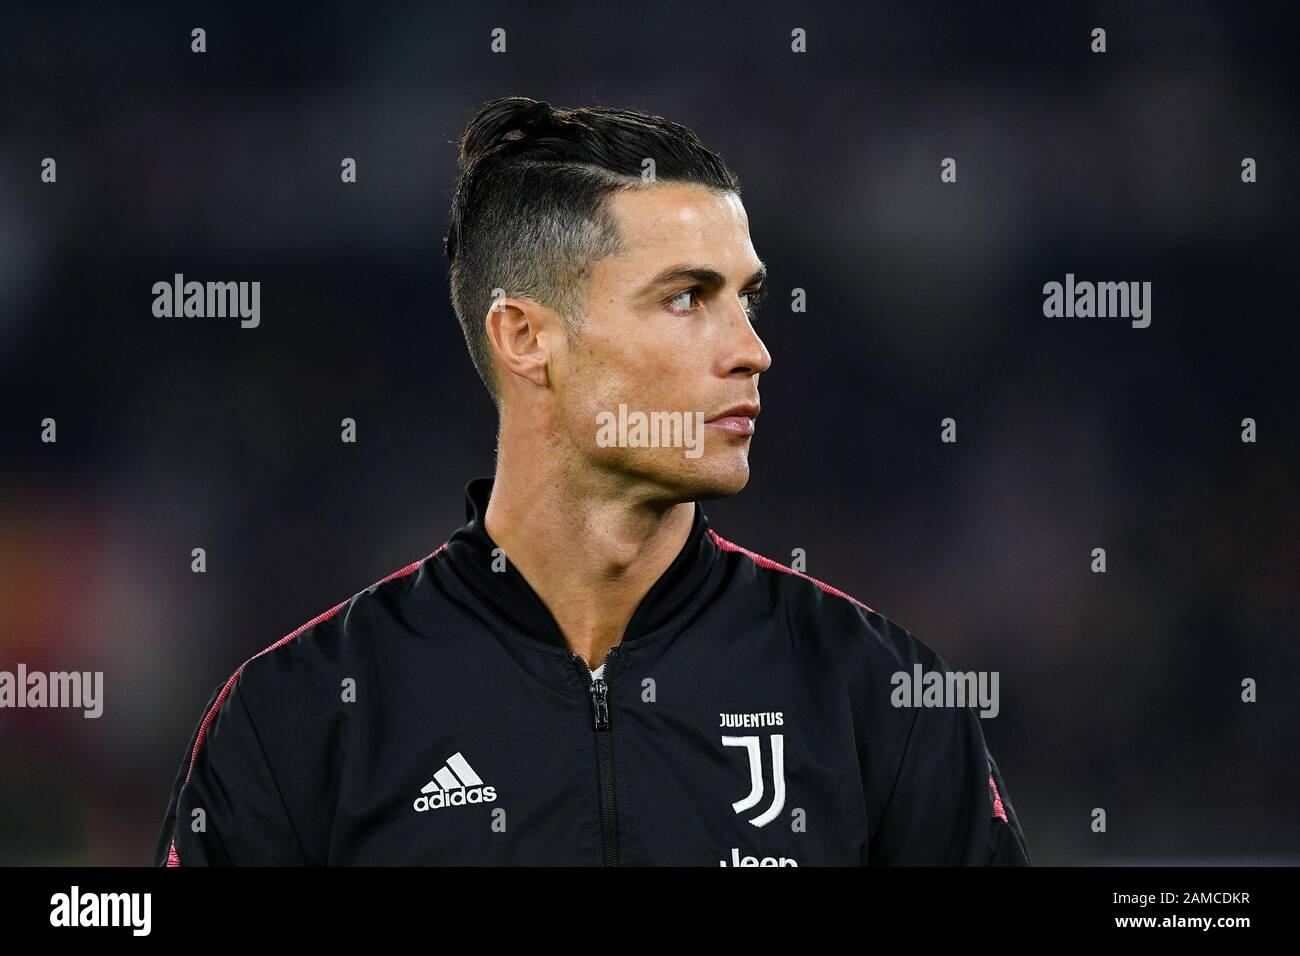 Roma Italy 12th Jan 2020 Cristiano Ronaldo Of Juventus Shows